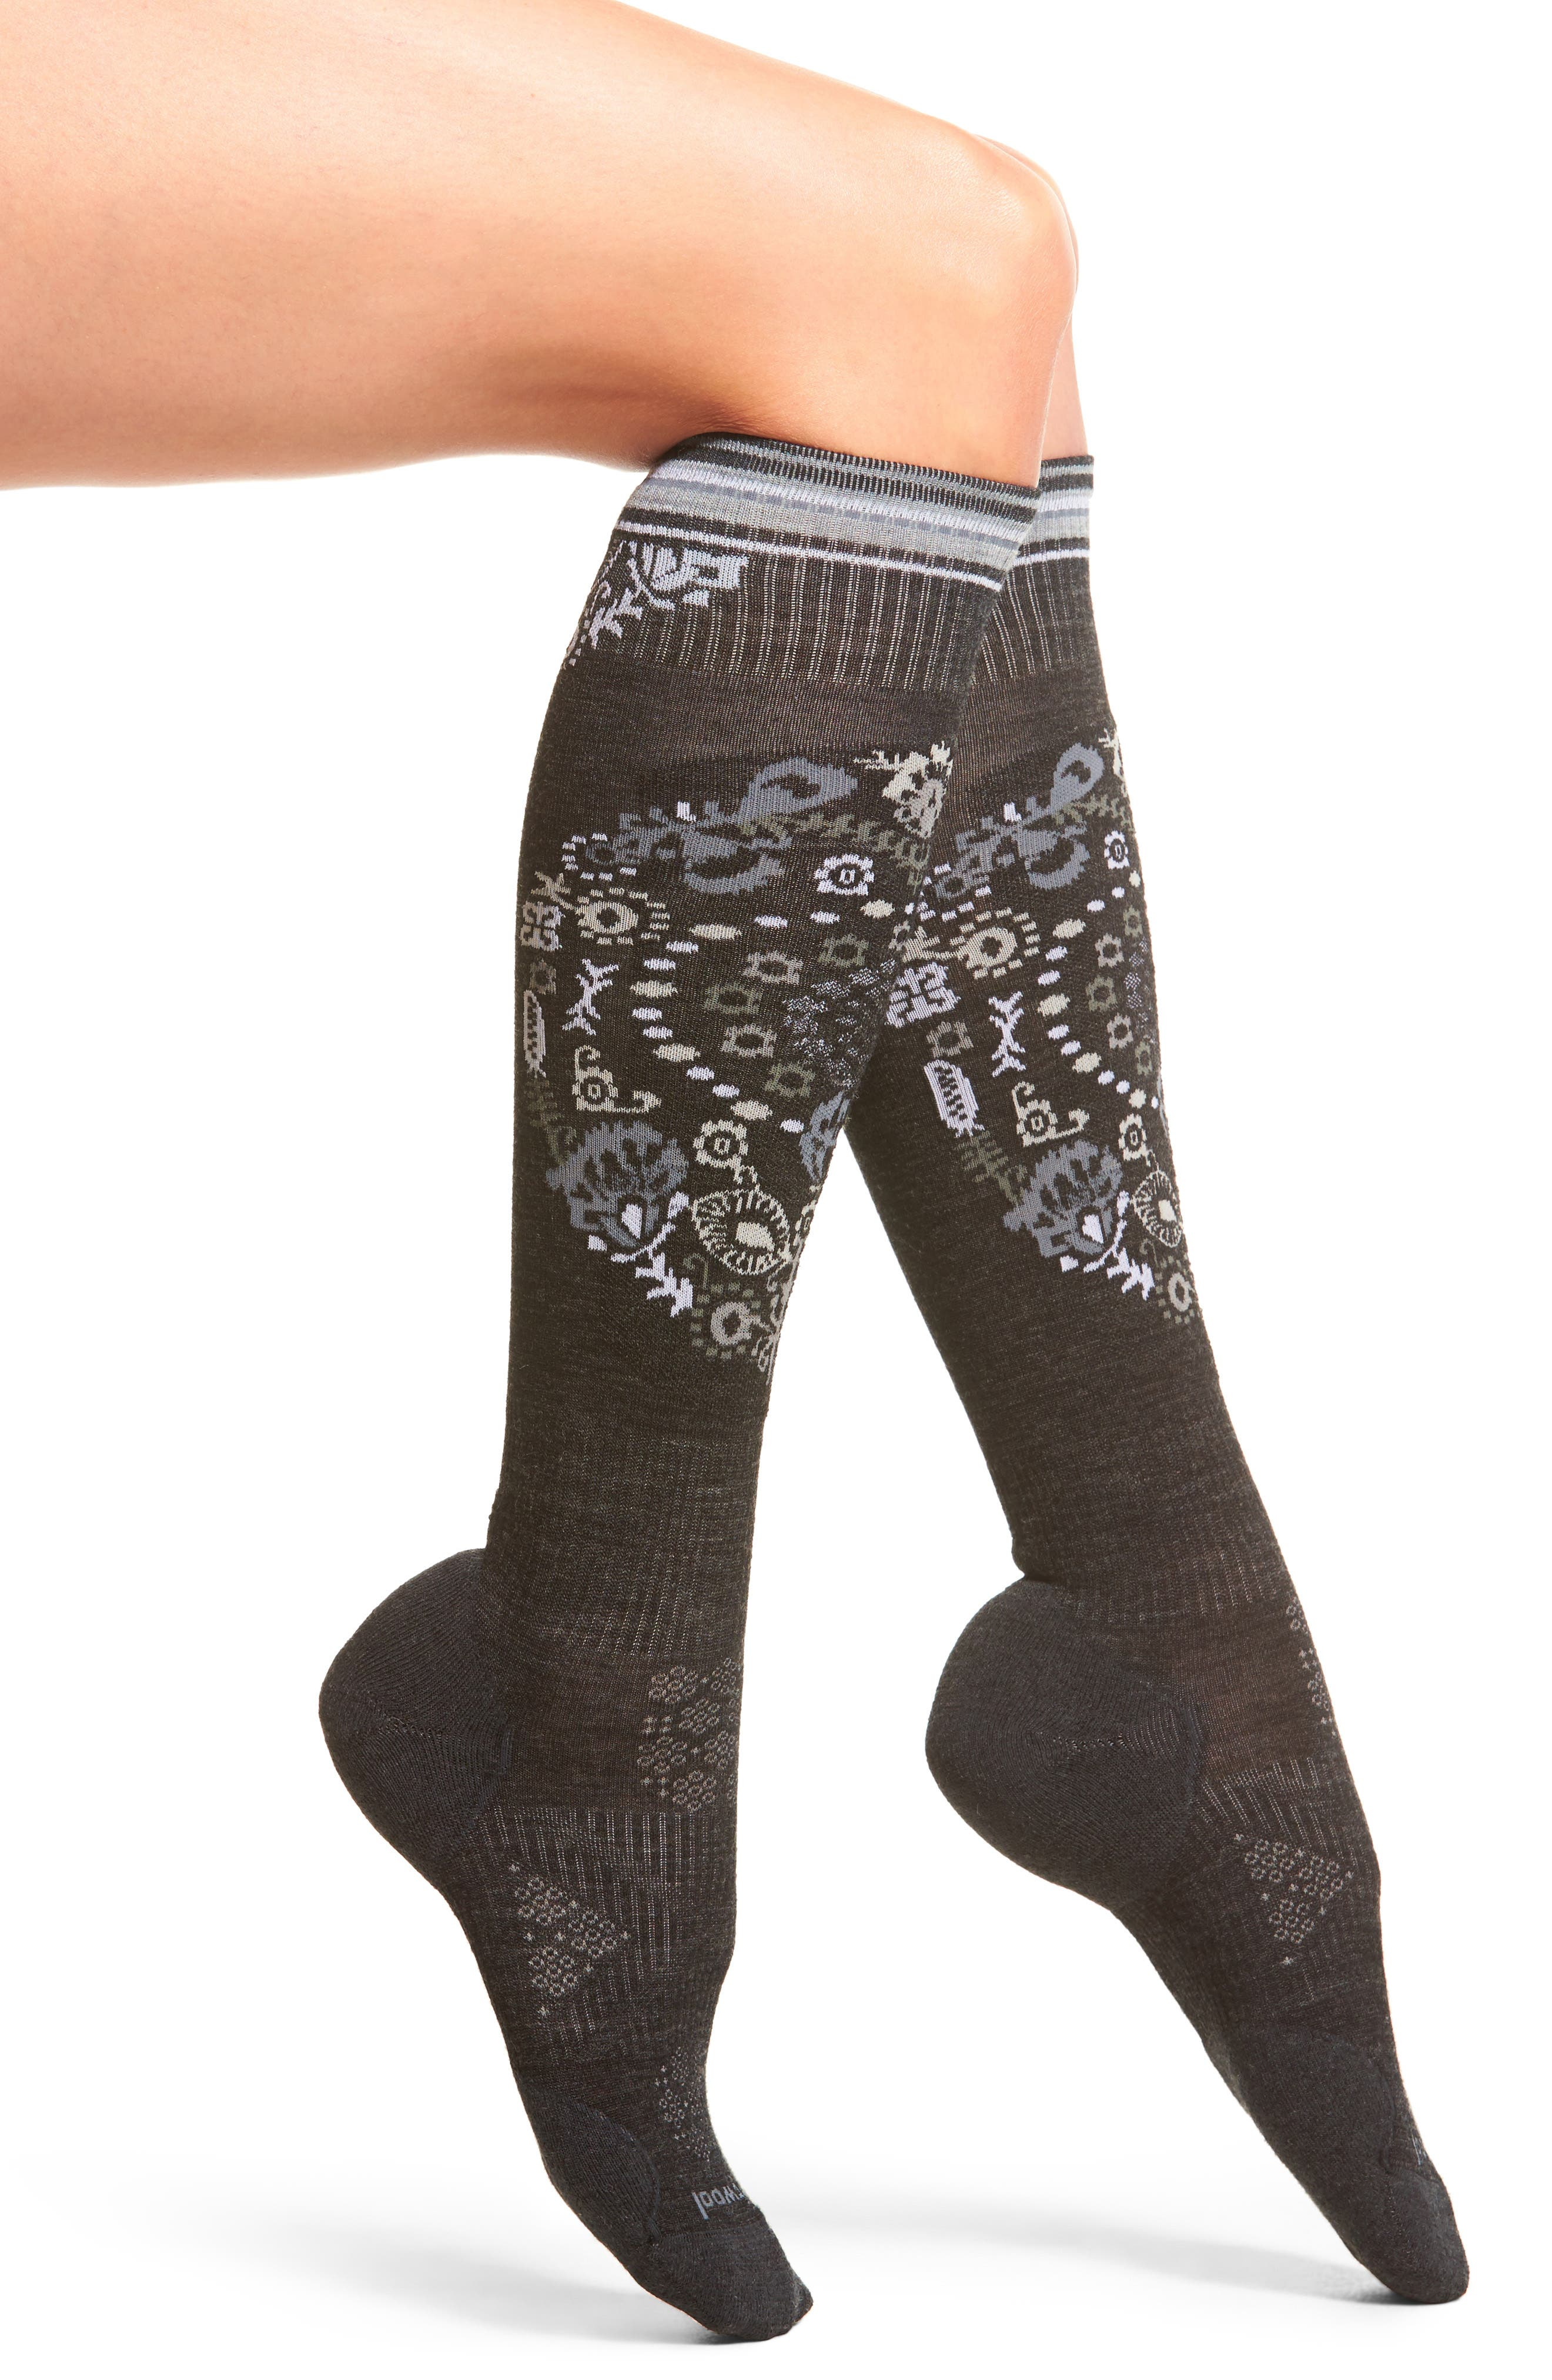 PhD<sup>®</sup> Ski Light Elite Paisley Socks,                             Main thumbnail 1, color,                             020